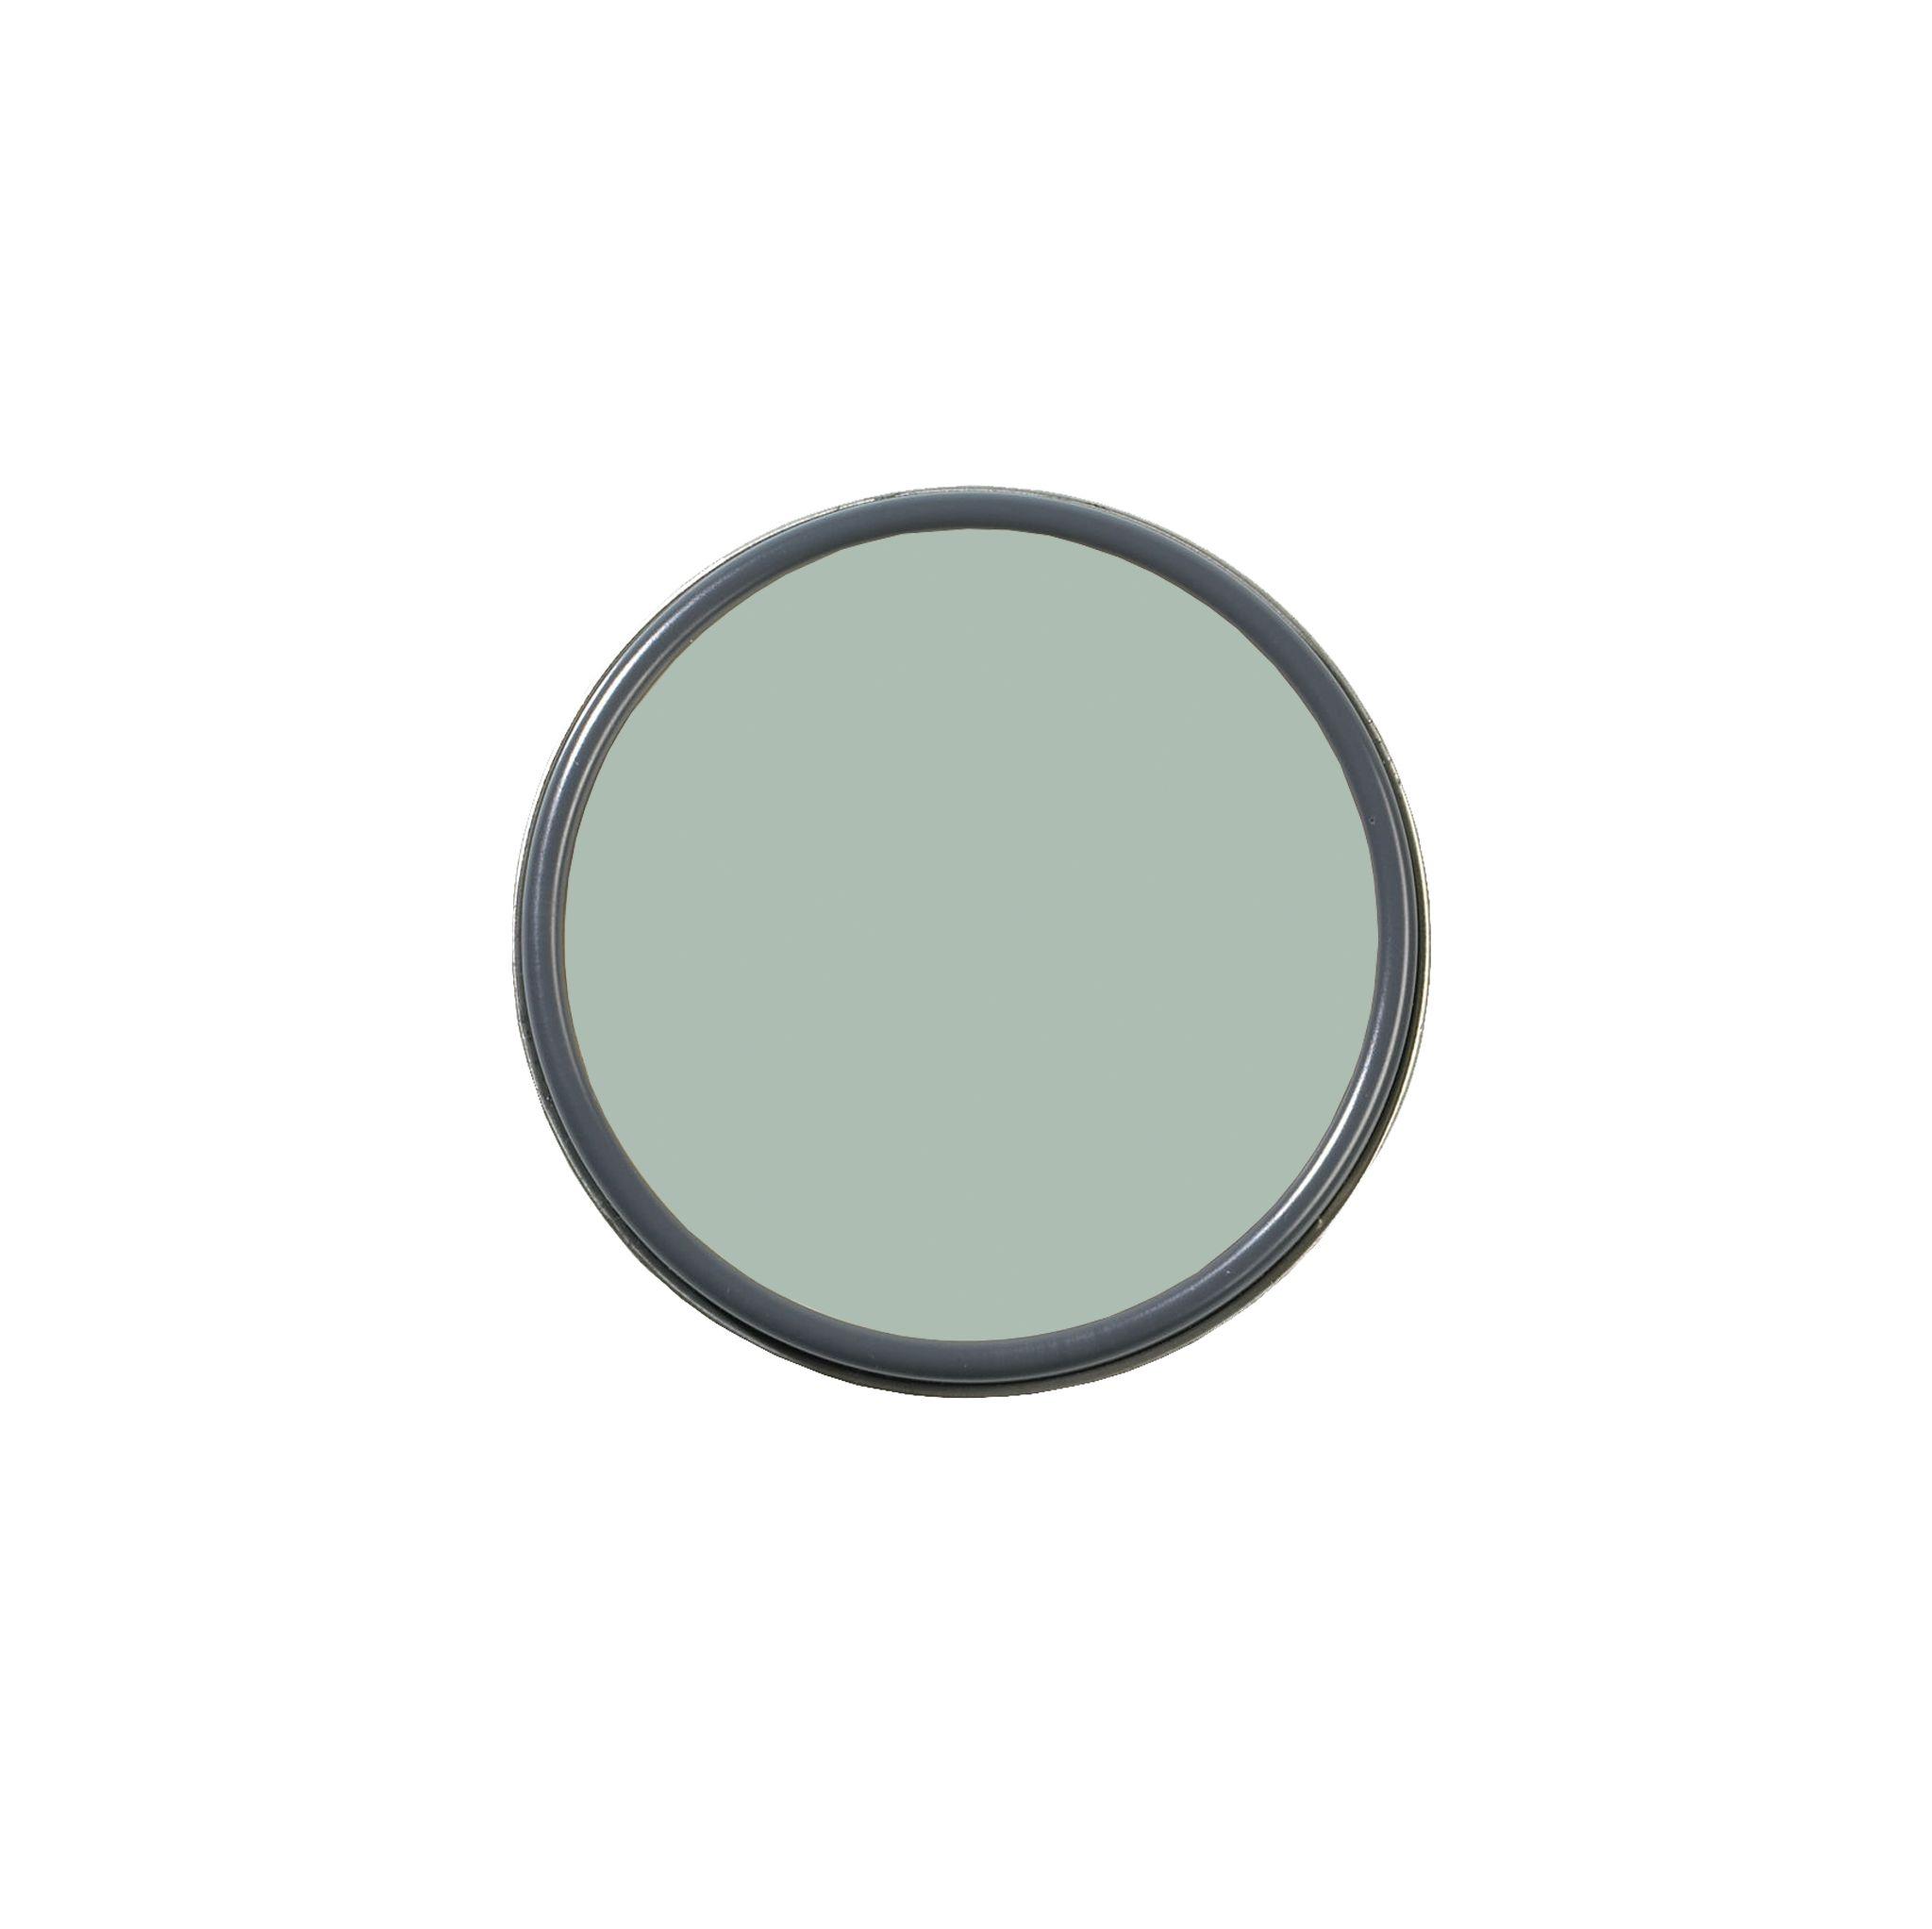 Farrow & Ball Green Blue